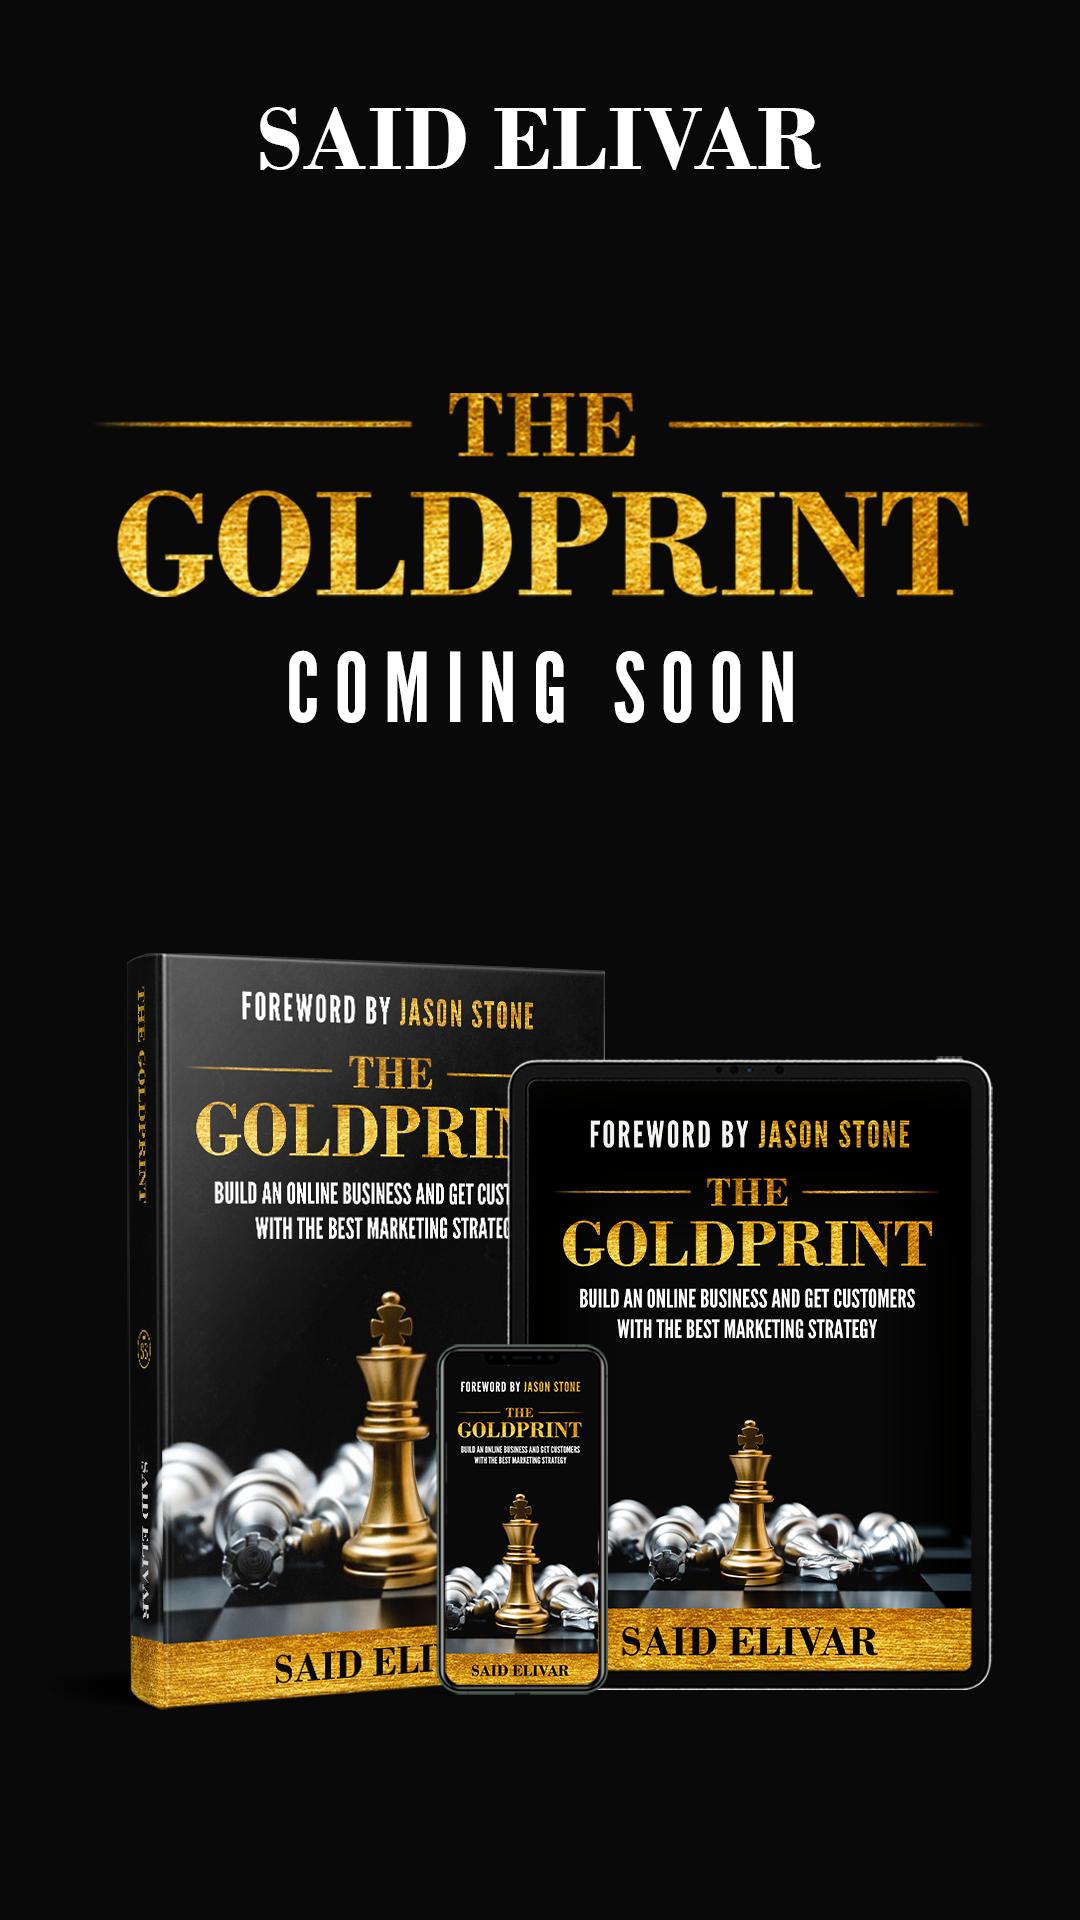 The Goldprint Promo